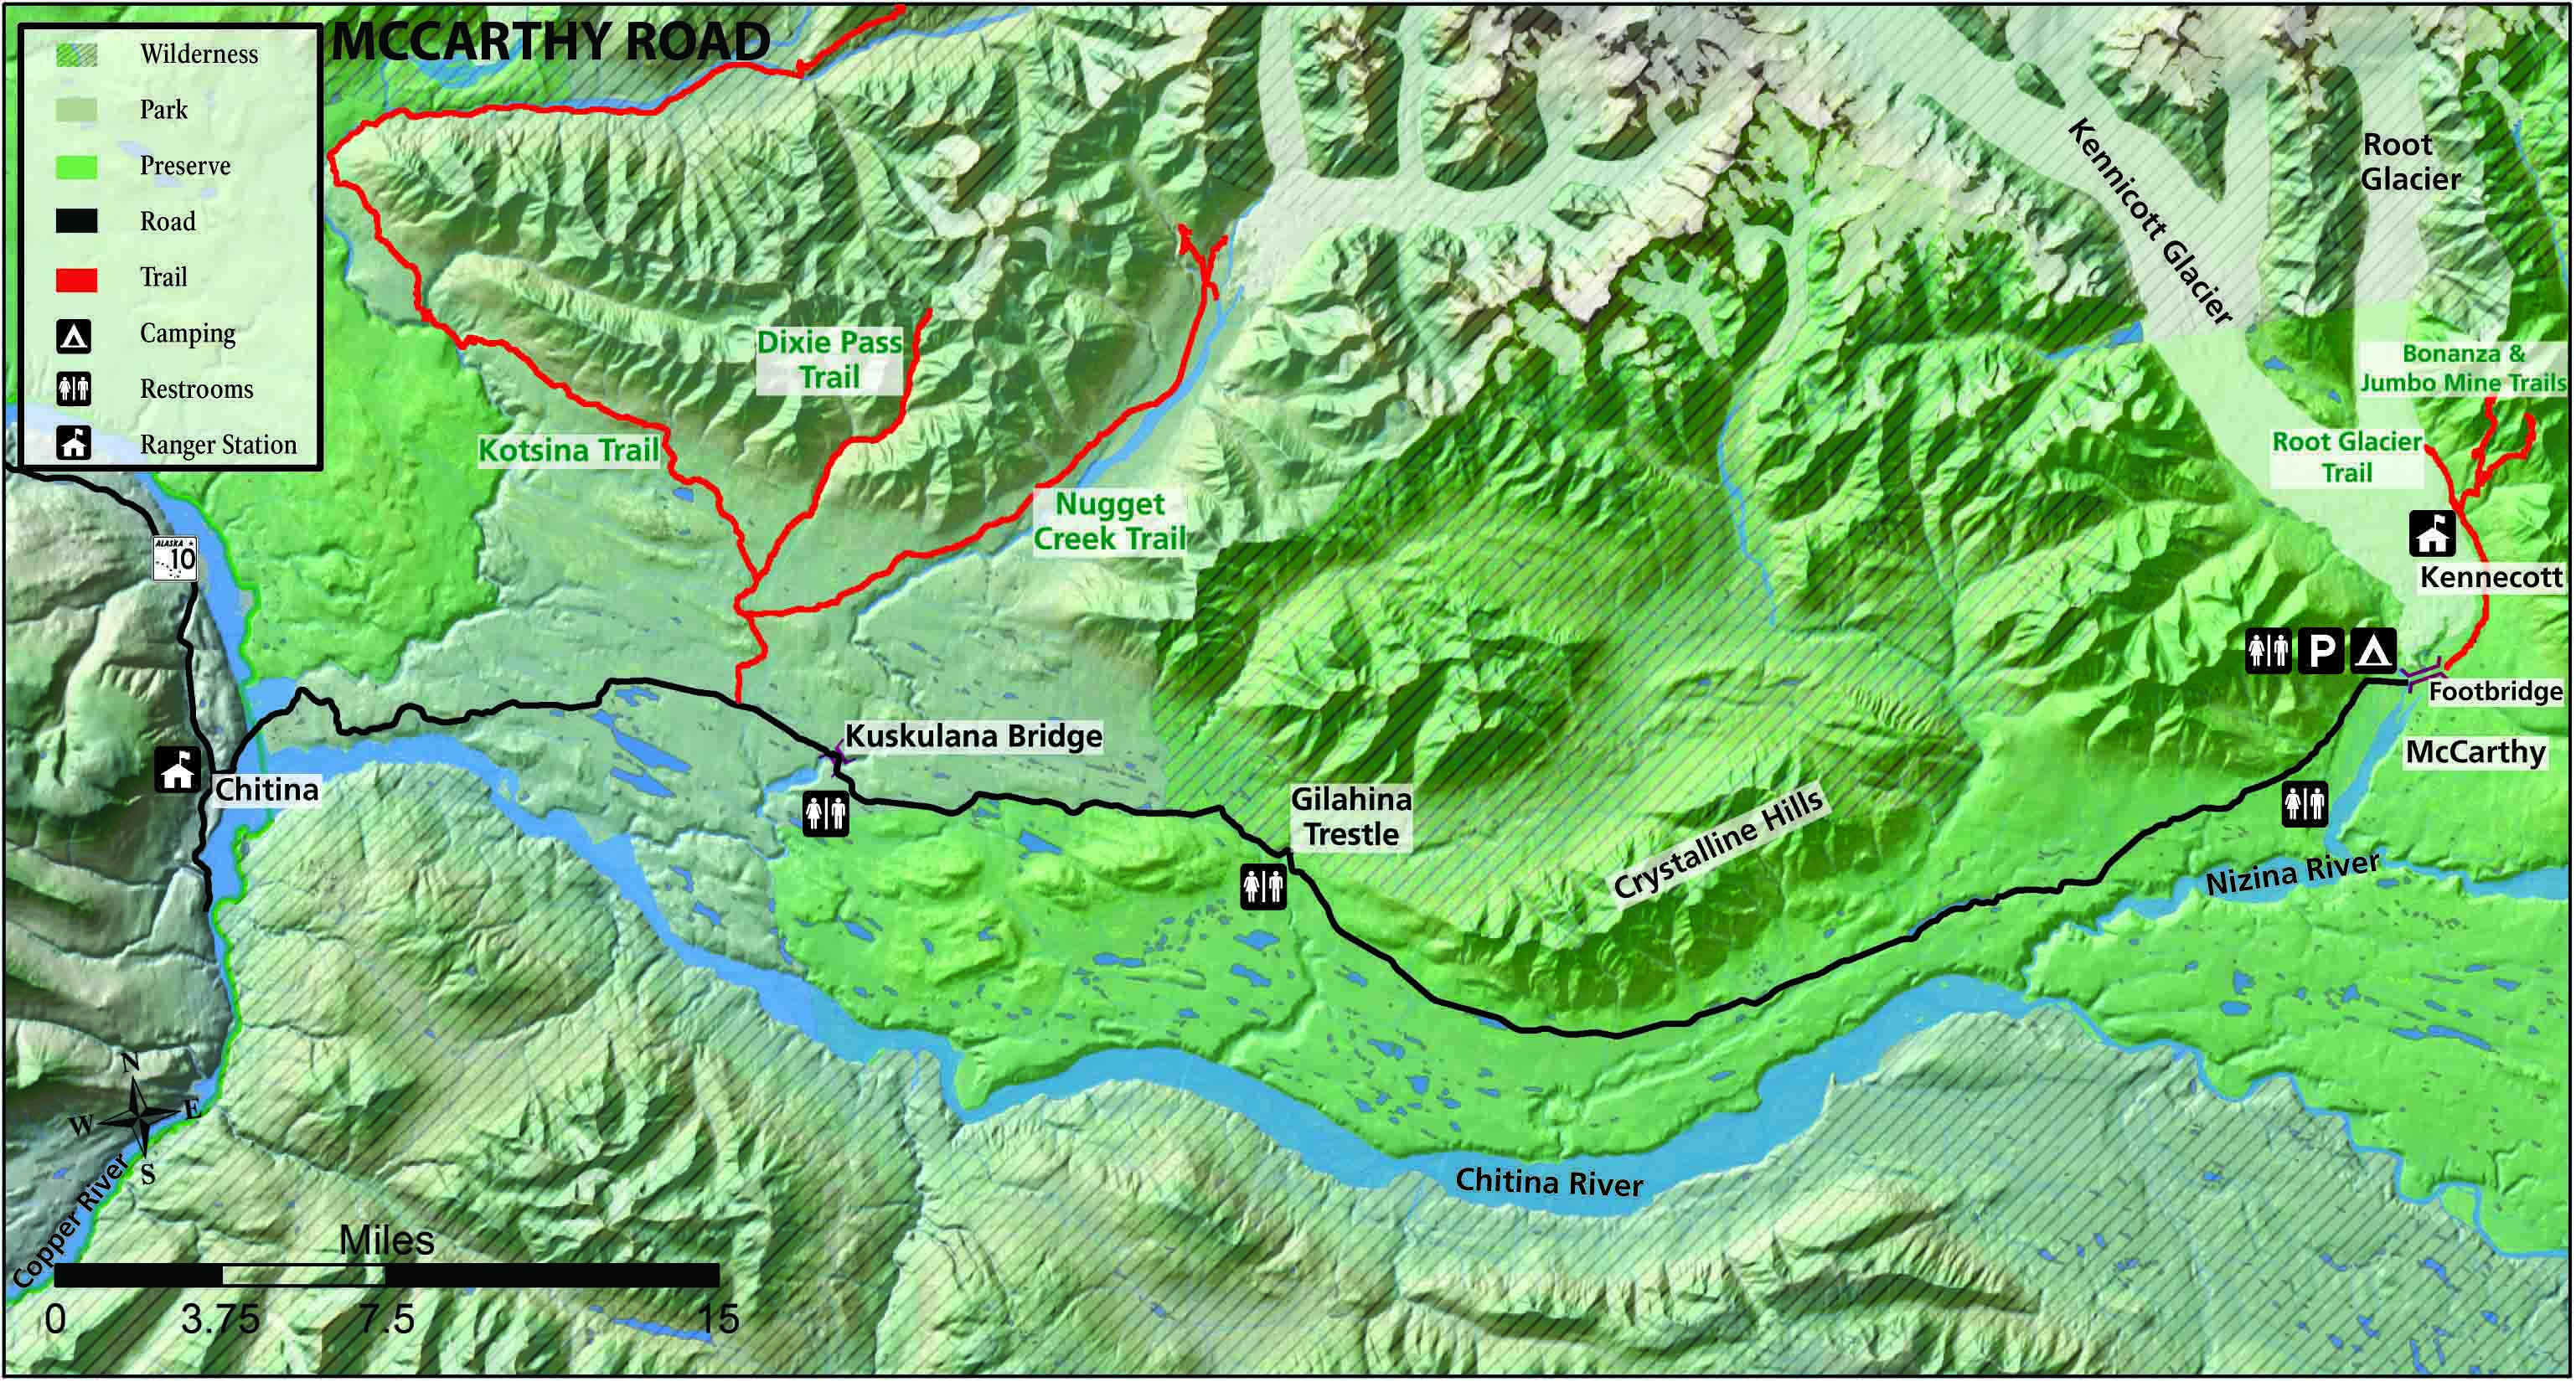 Off Road Vehicle ORV Trails Wrangell St Elias National Park